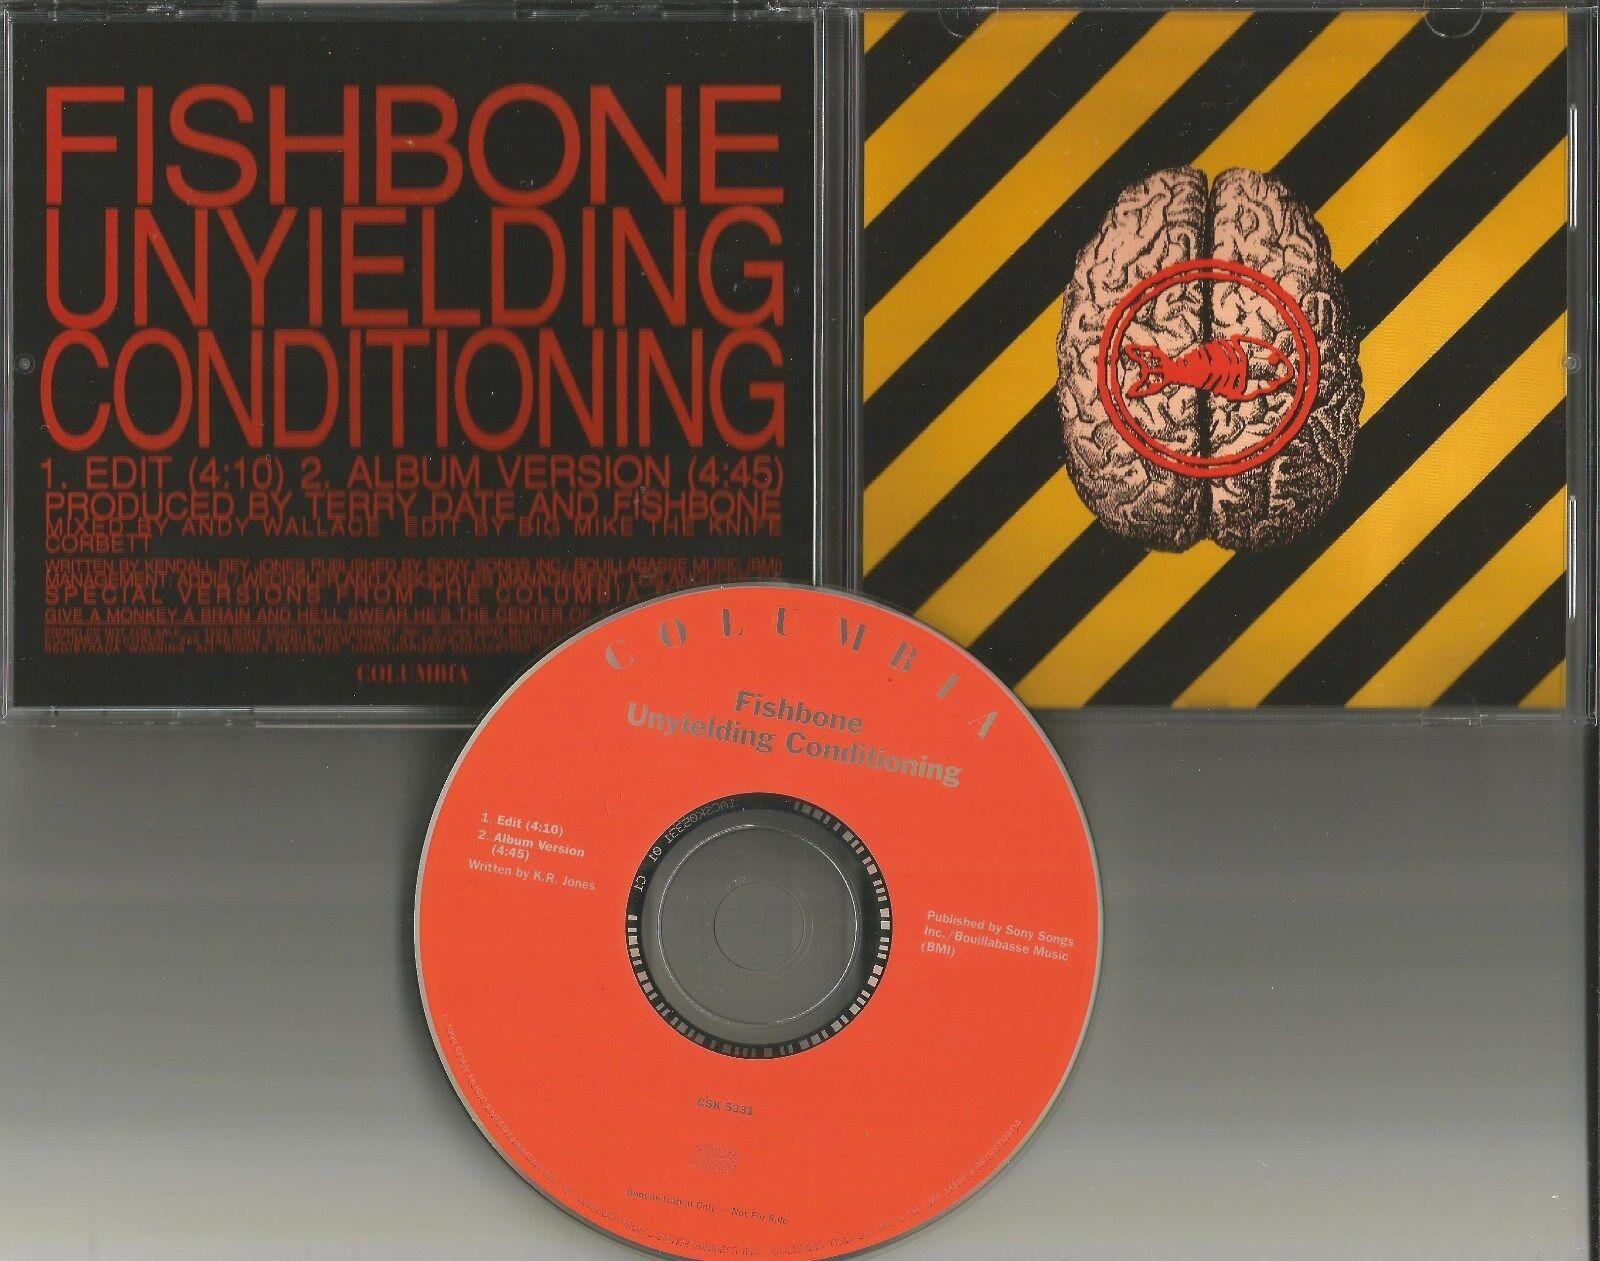 FISHBONE Unyielding Love w/ RARE EDIT PROMO DJ CD single w/ TOUR DATES 1993 MINT